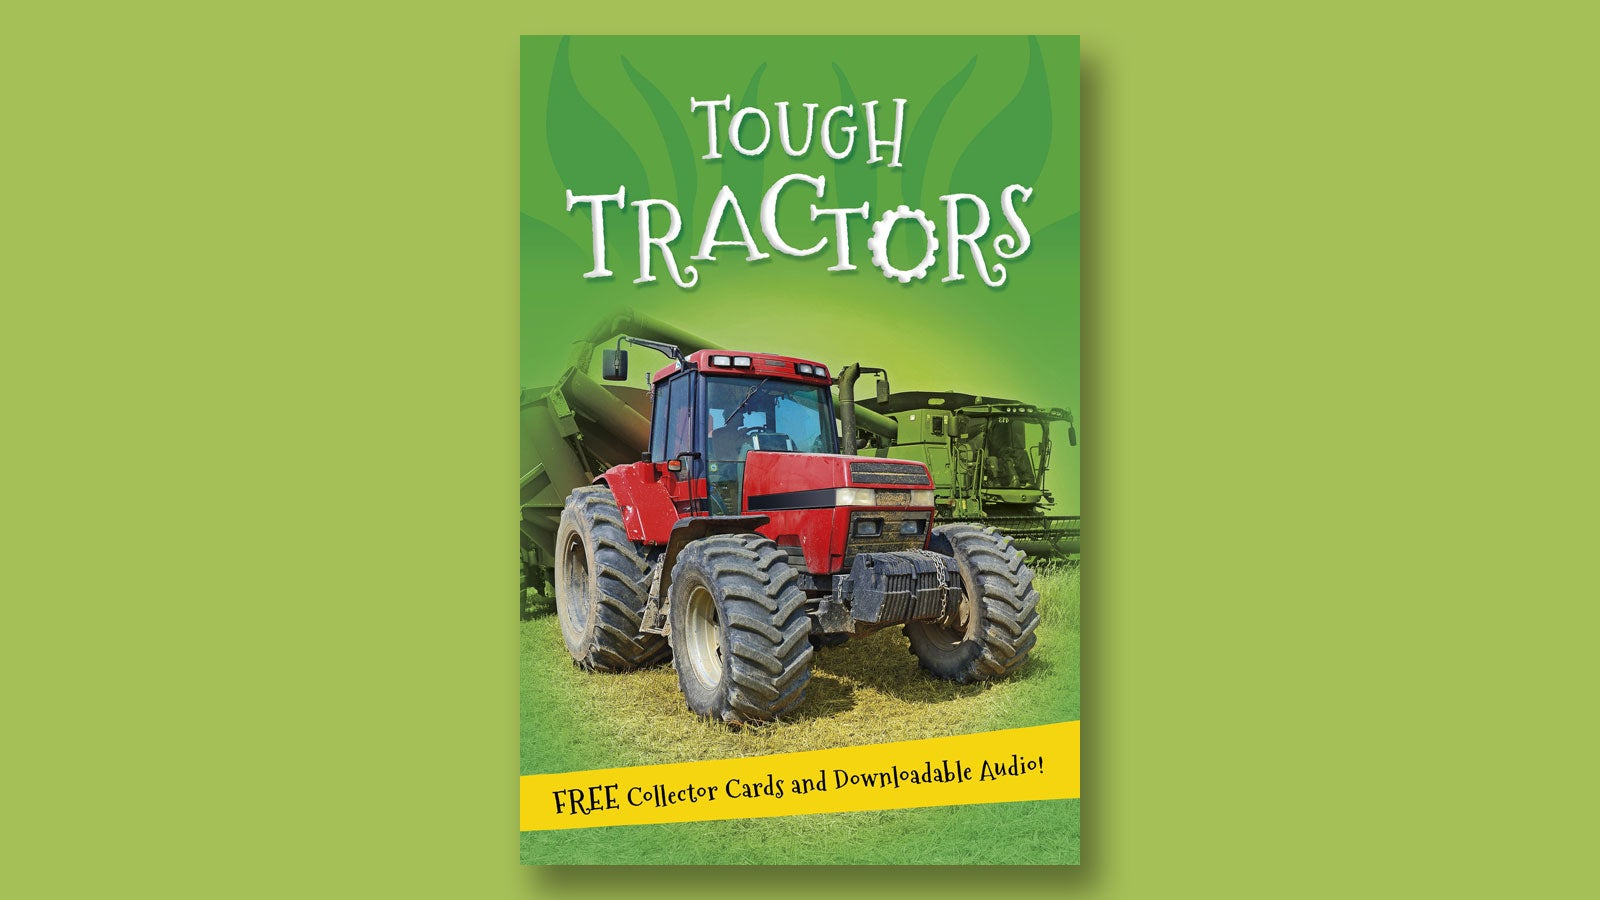 Tough Tractors book cover